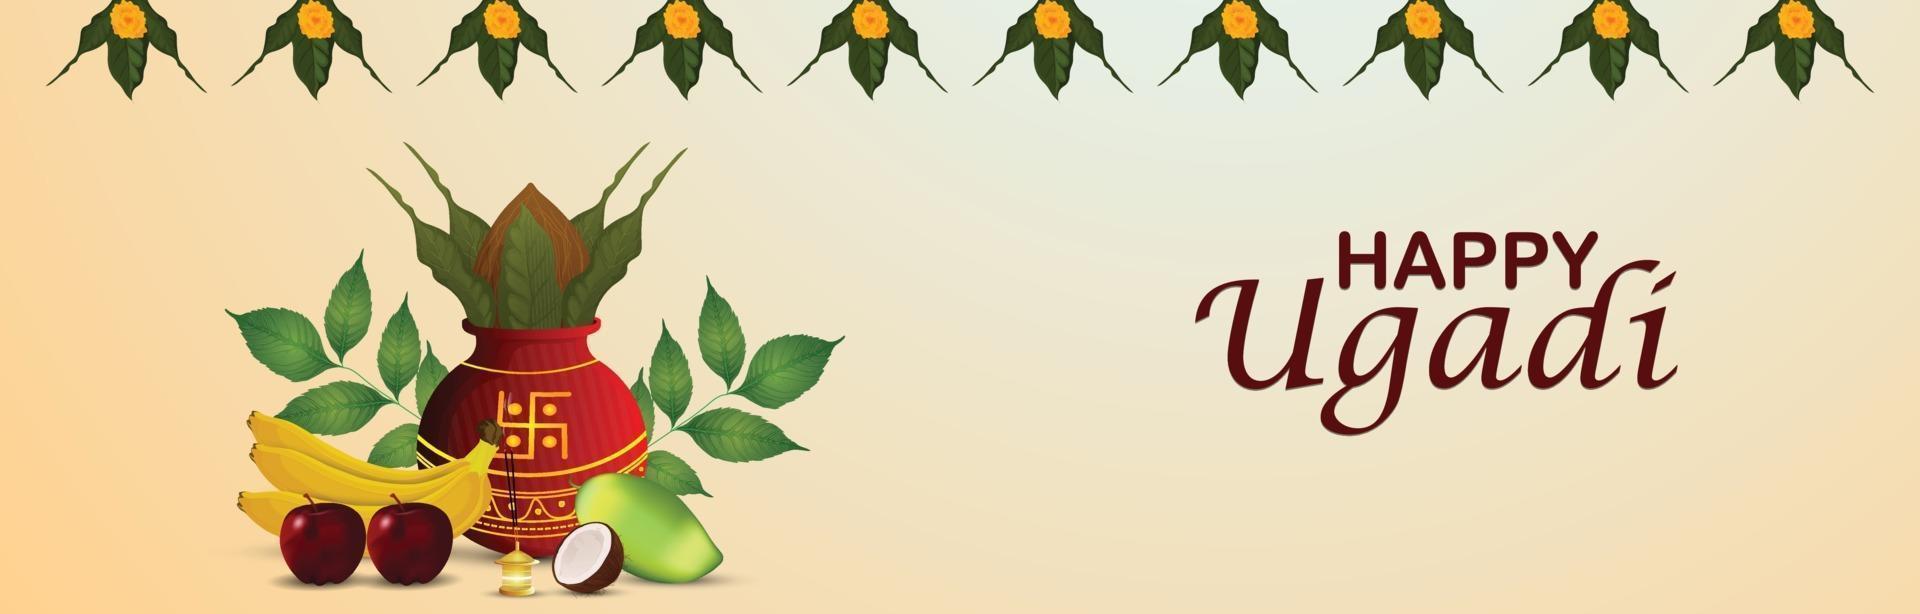 banner de celebração feliz gudi padwa com kalash realista vetor